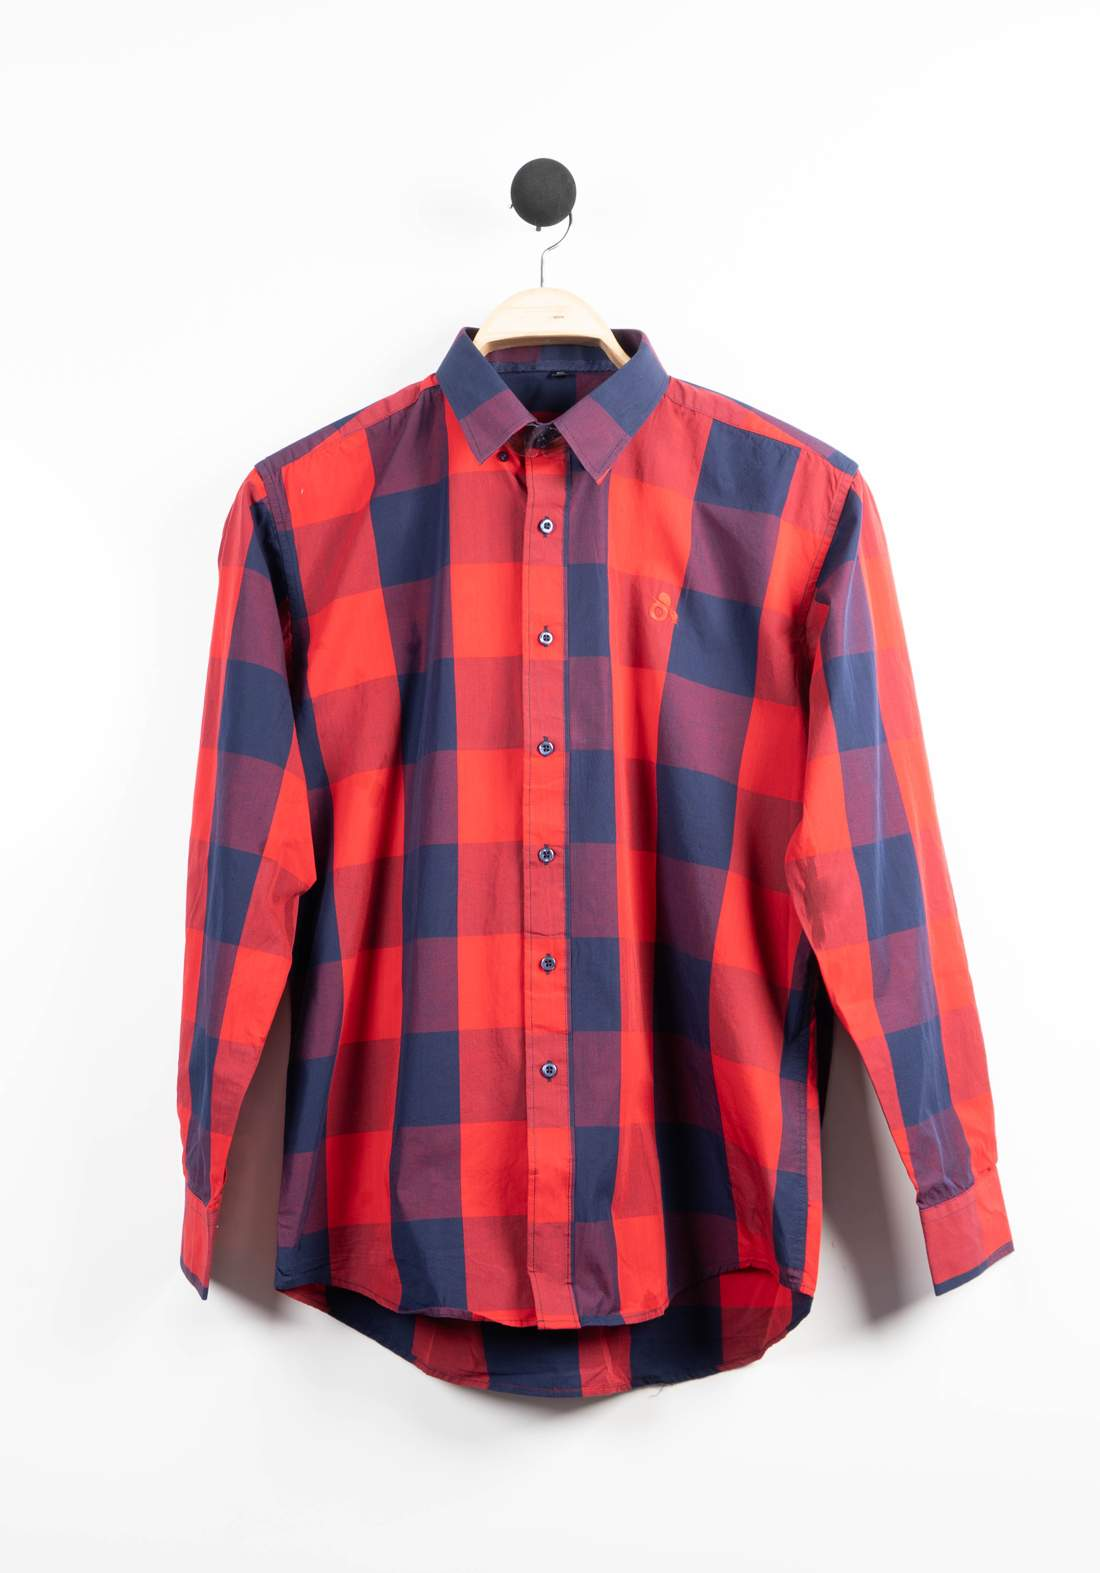 قميص رجالي متعدد الالوان